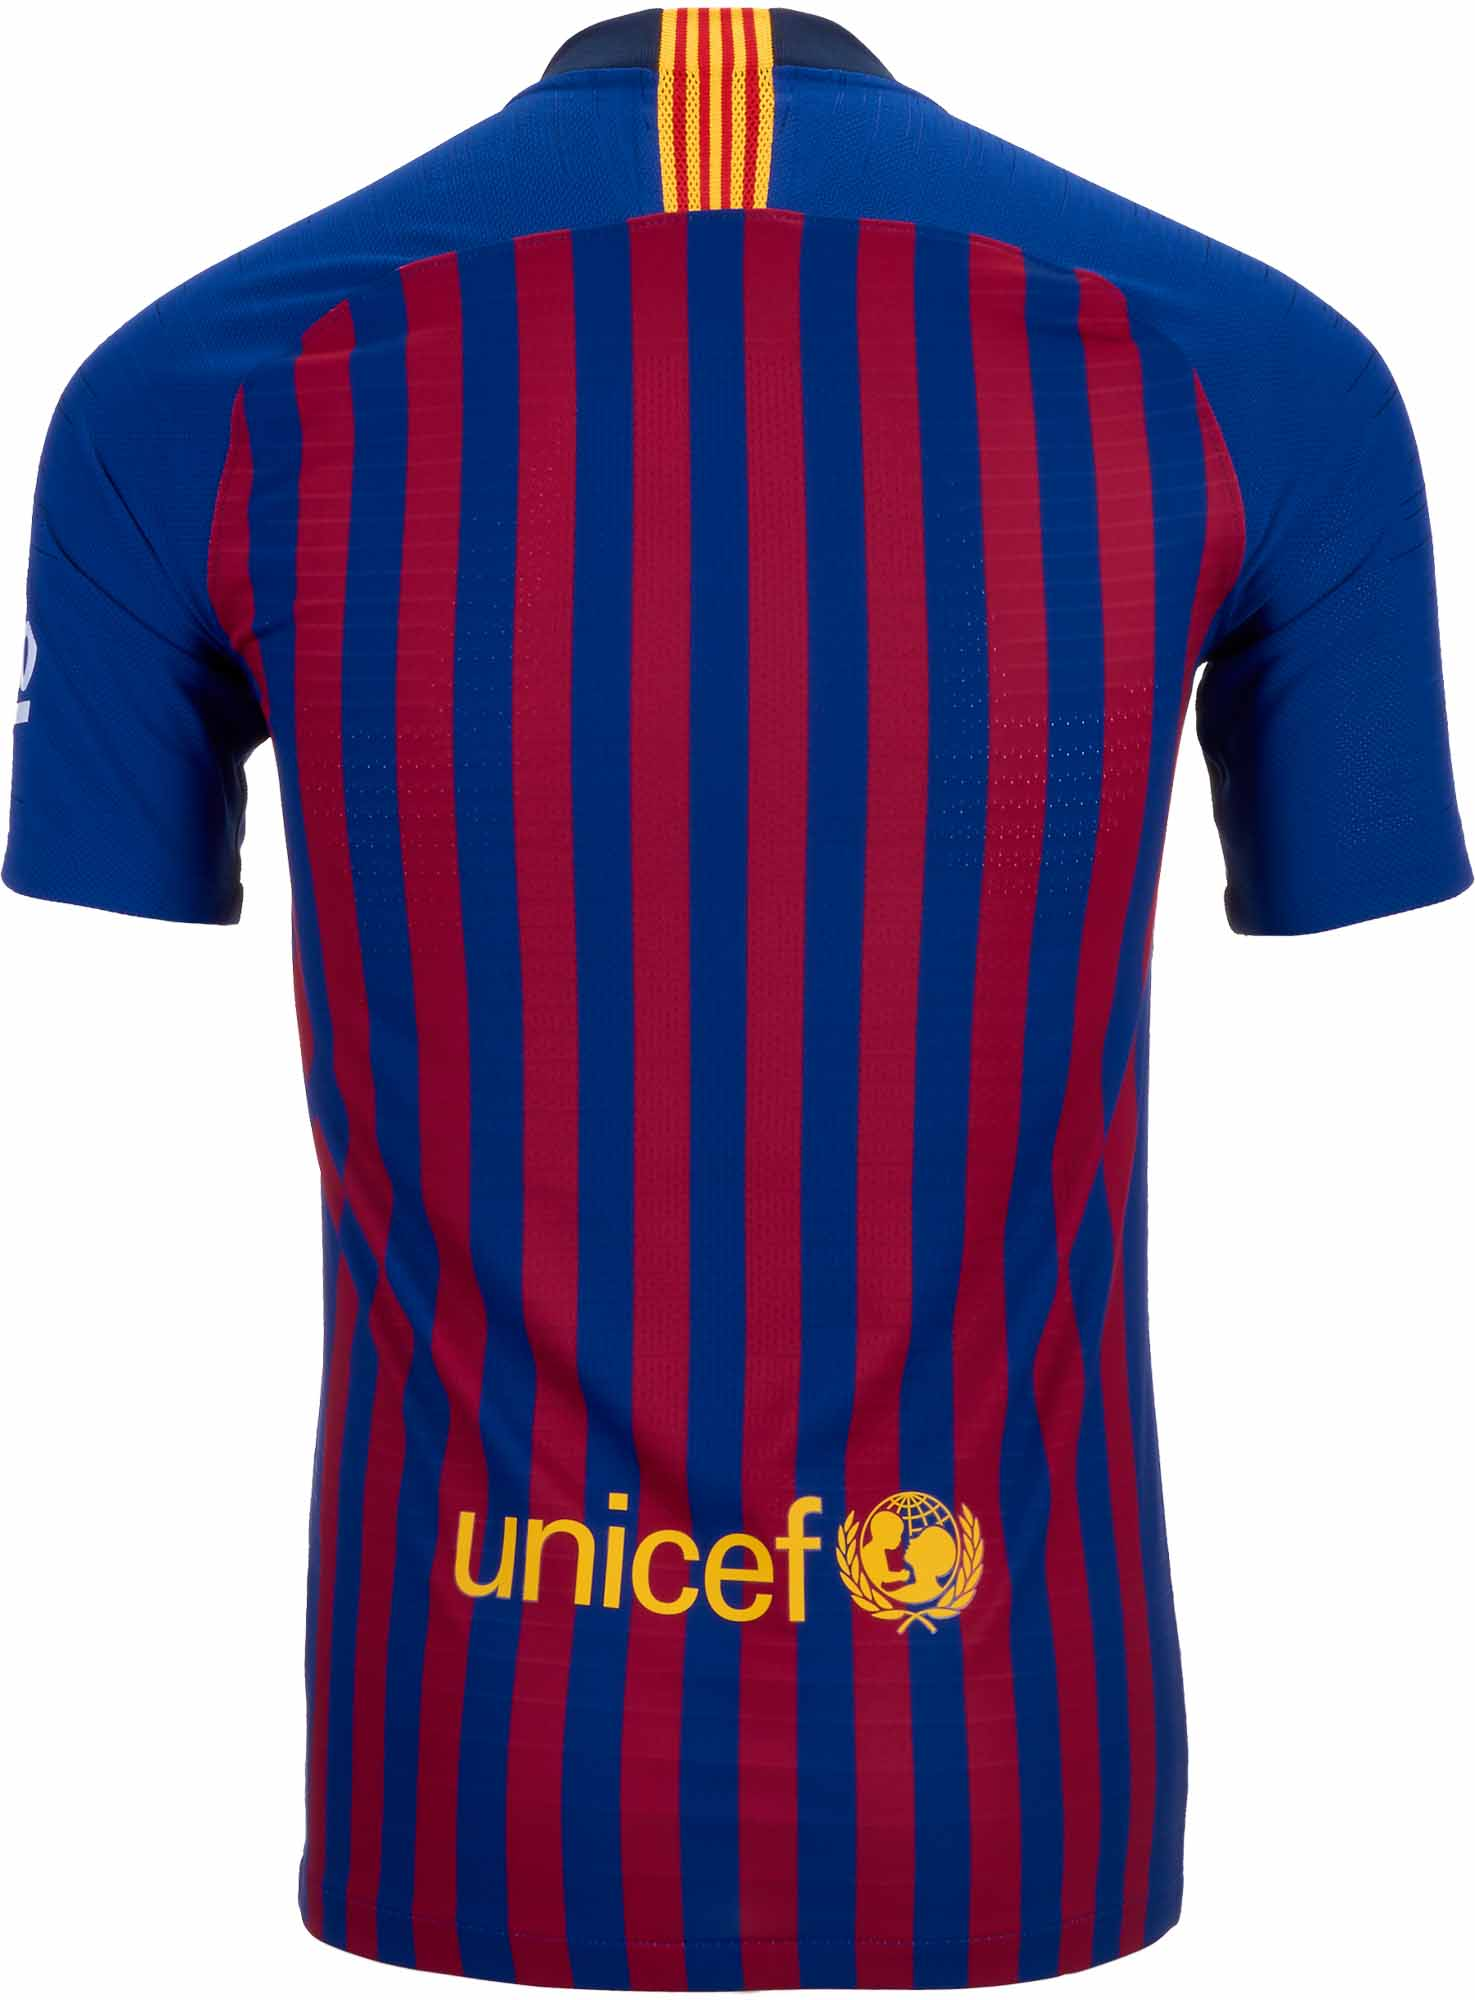 newest 29a05 0607d 2018/19 Nike Barcelona Home Match Jersey - Soccer Master